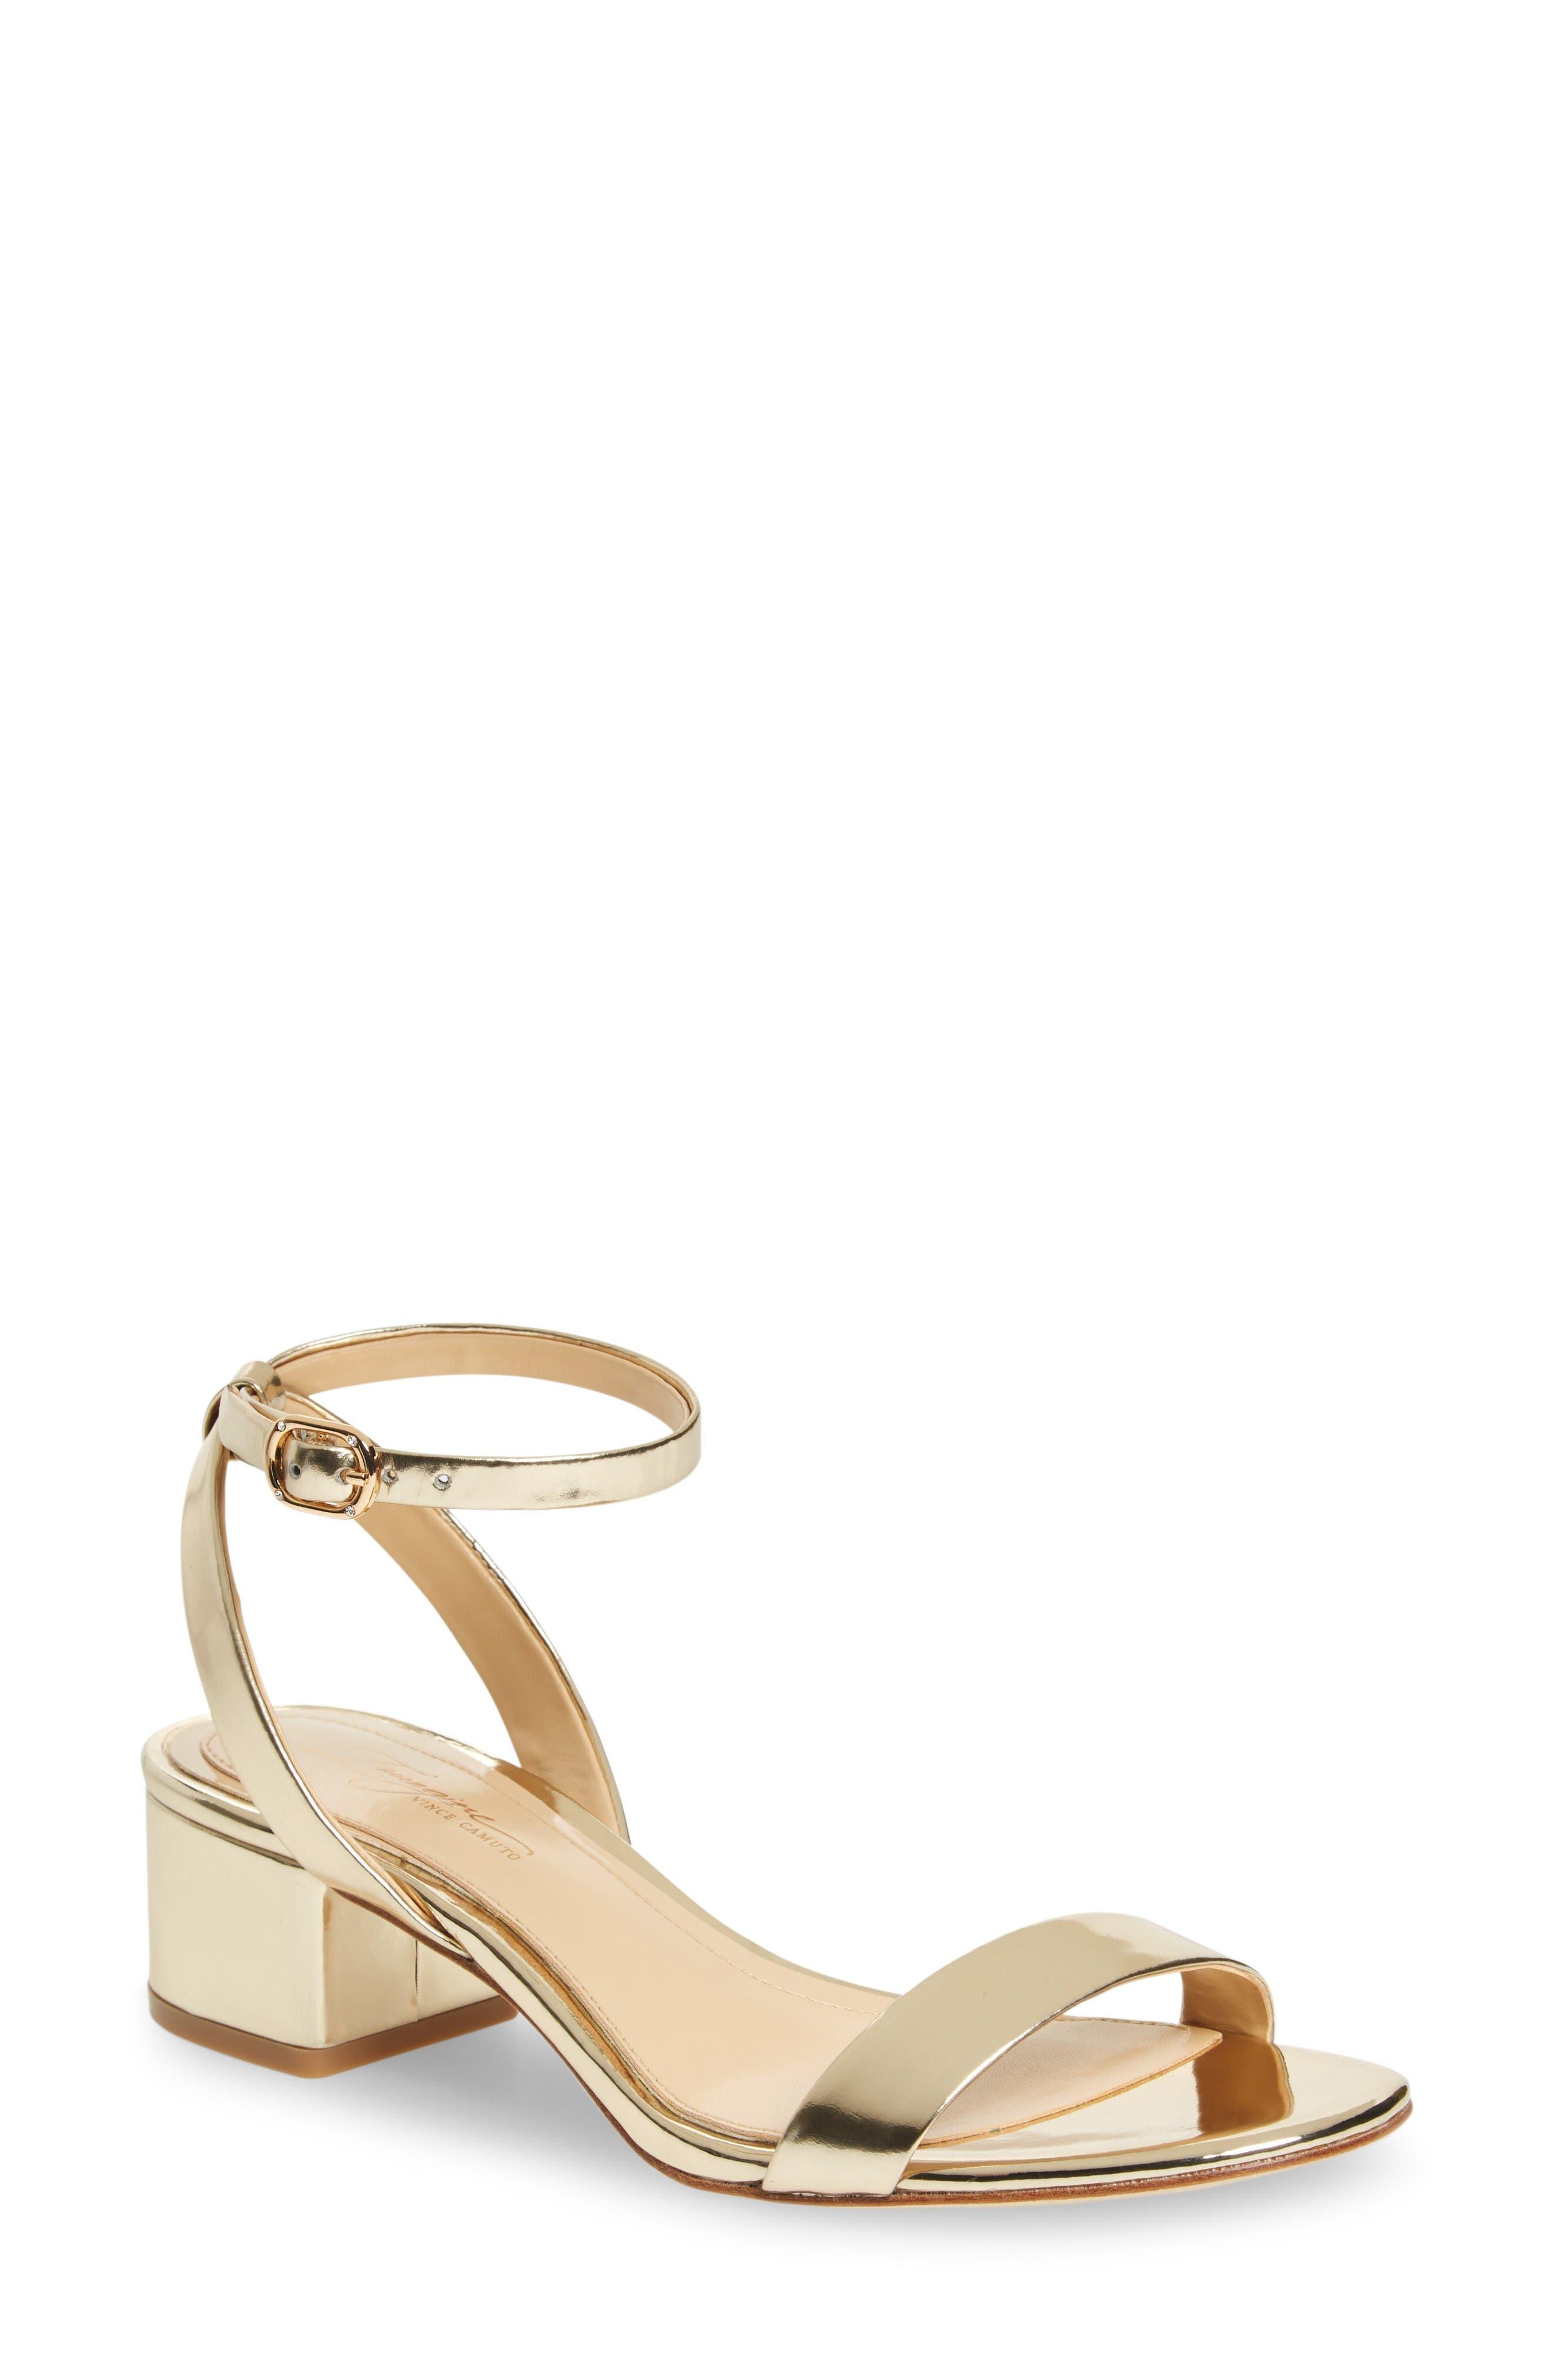 Imagine Vince Camuto Bavel Sandal,                         Main,                         color, Soft Gold Leather